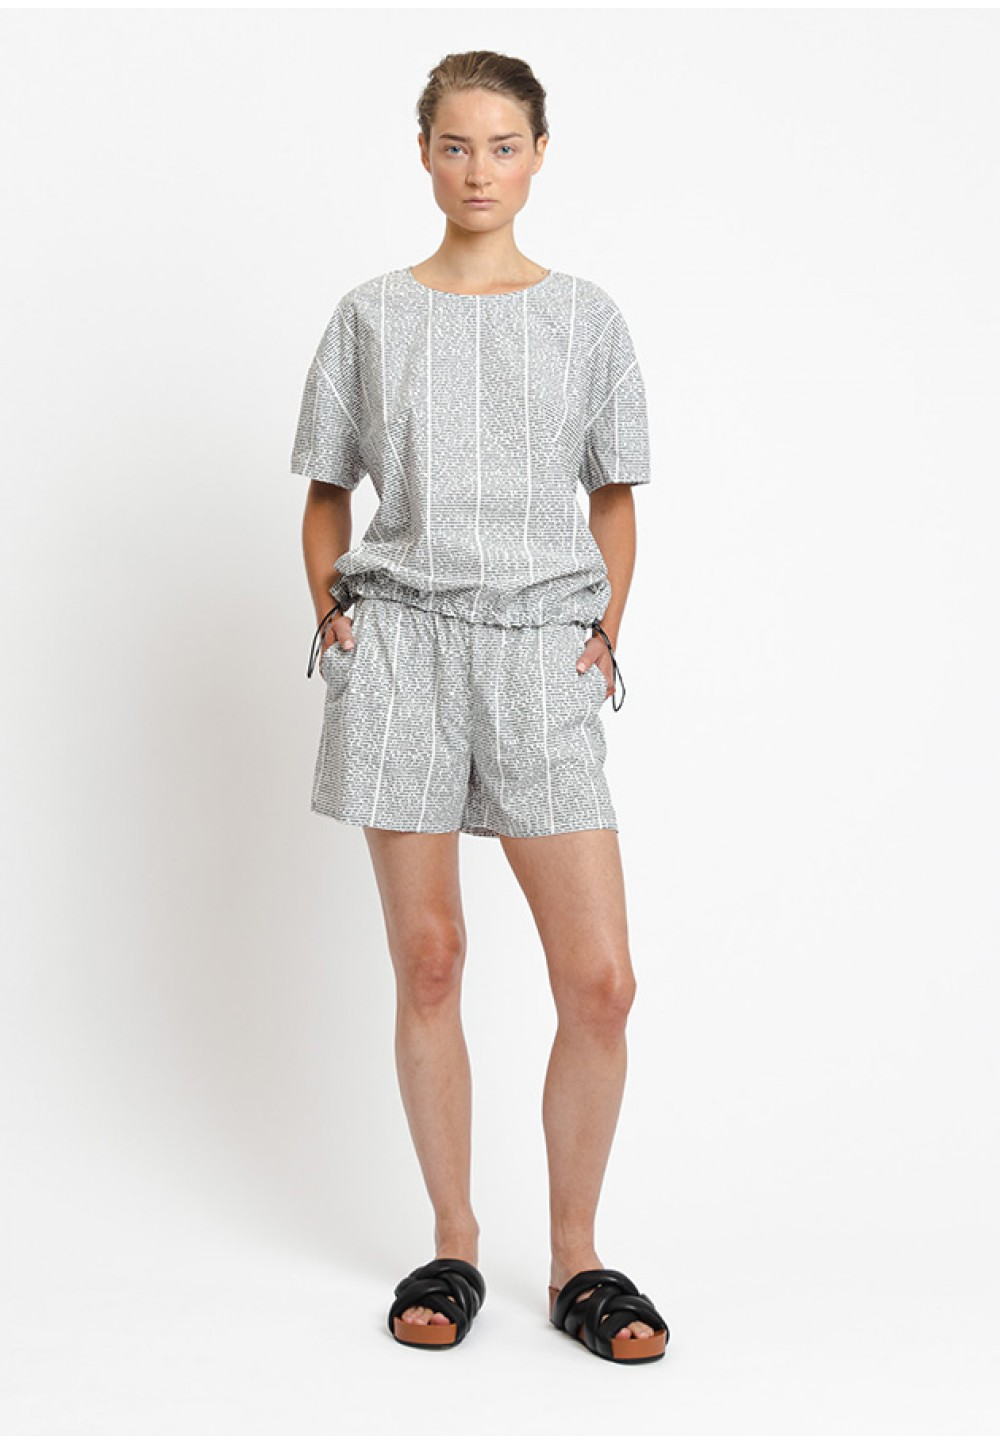 Хлопковая блуза с коротким рукавом